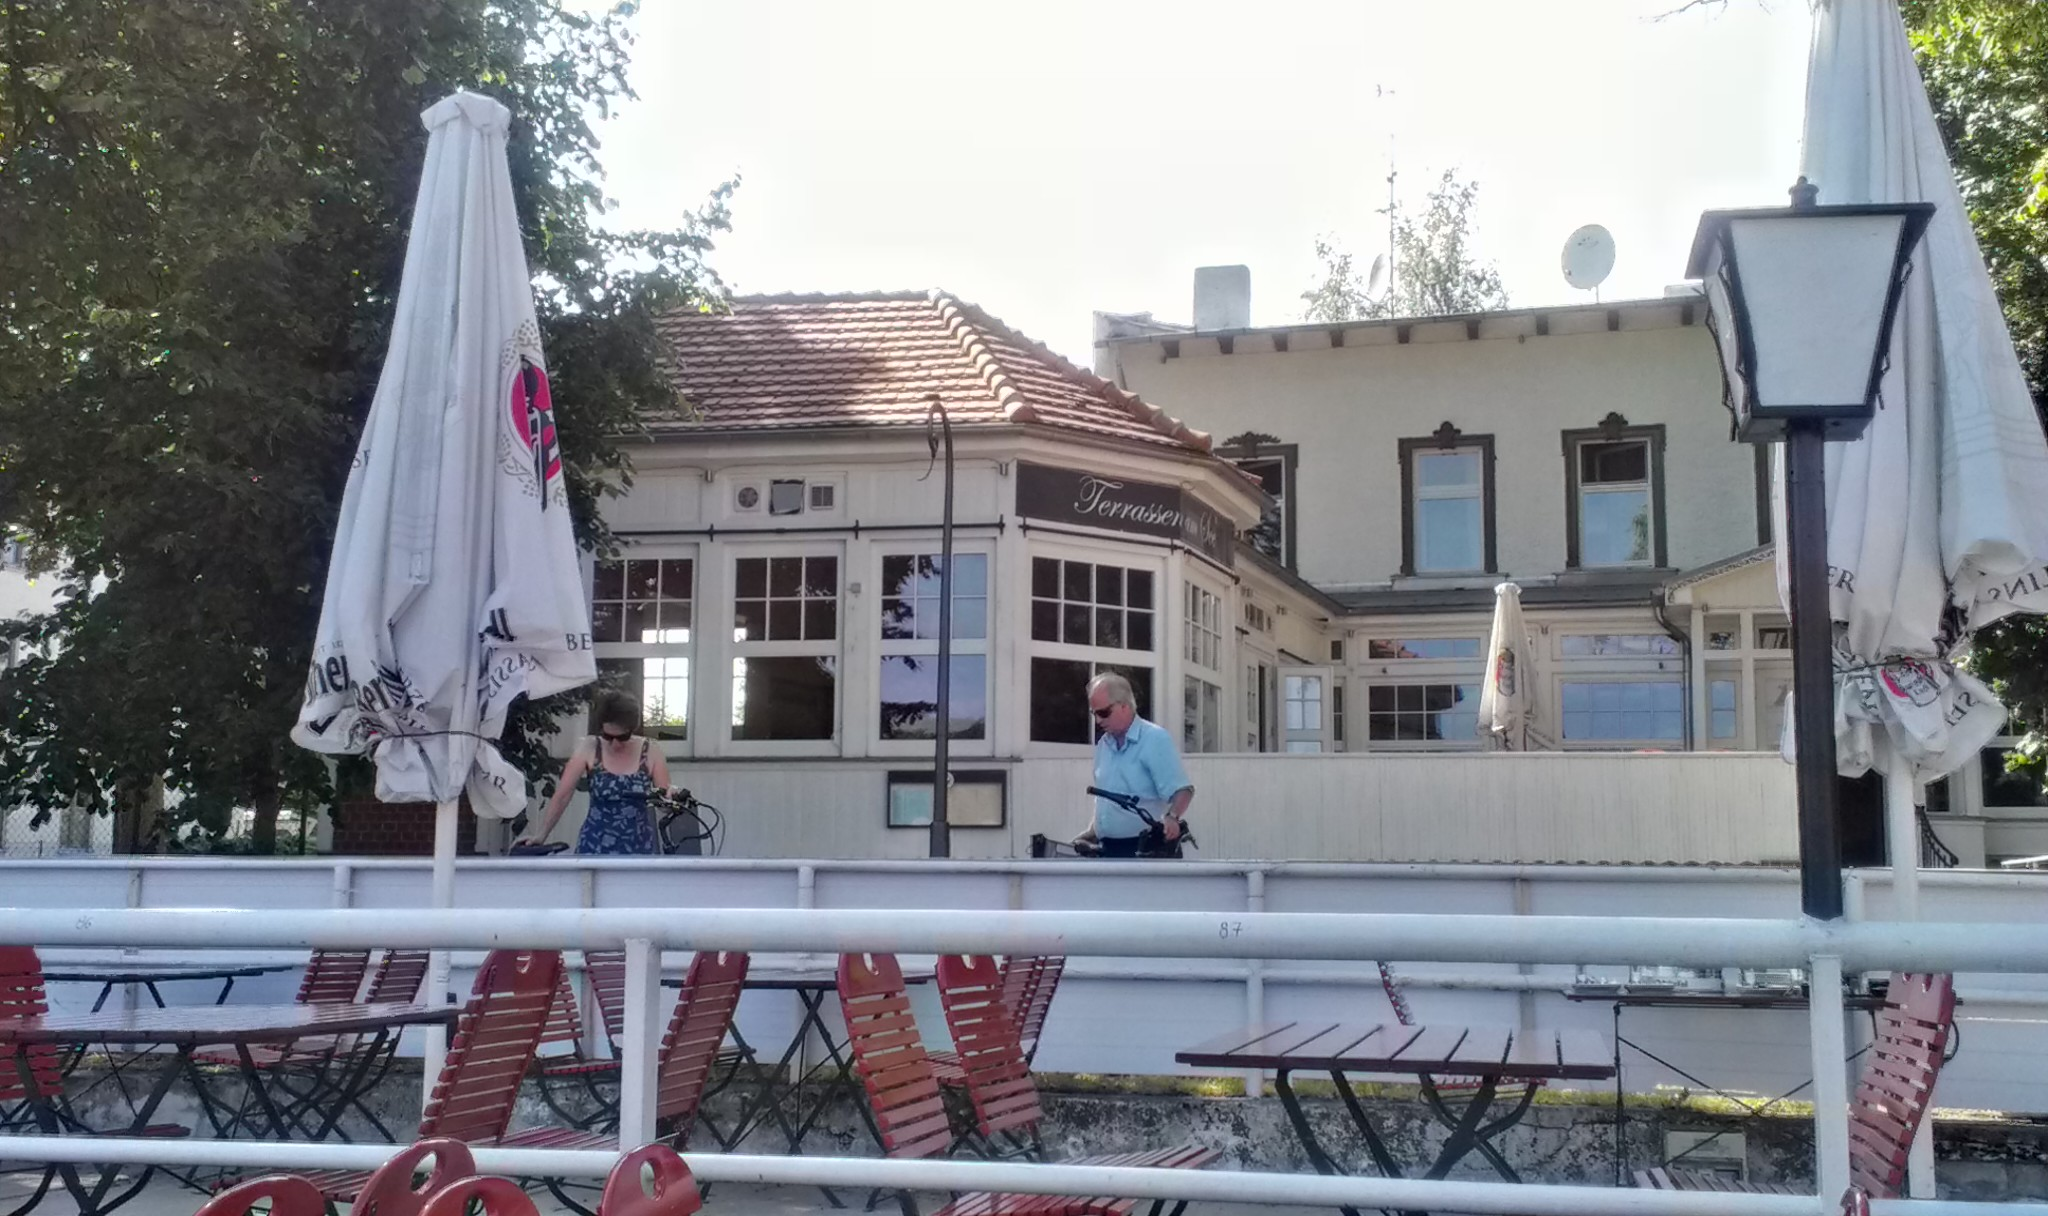 Terrassen am See Tegelort